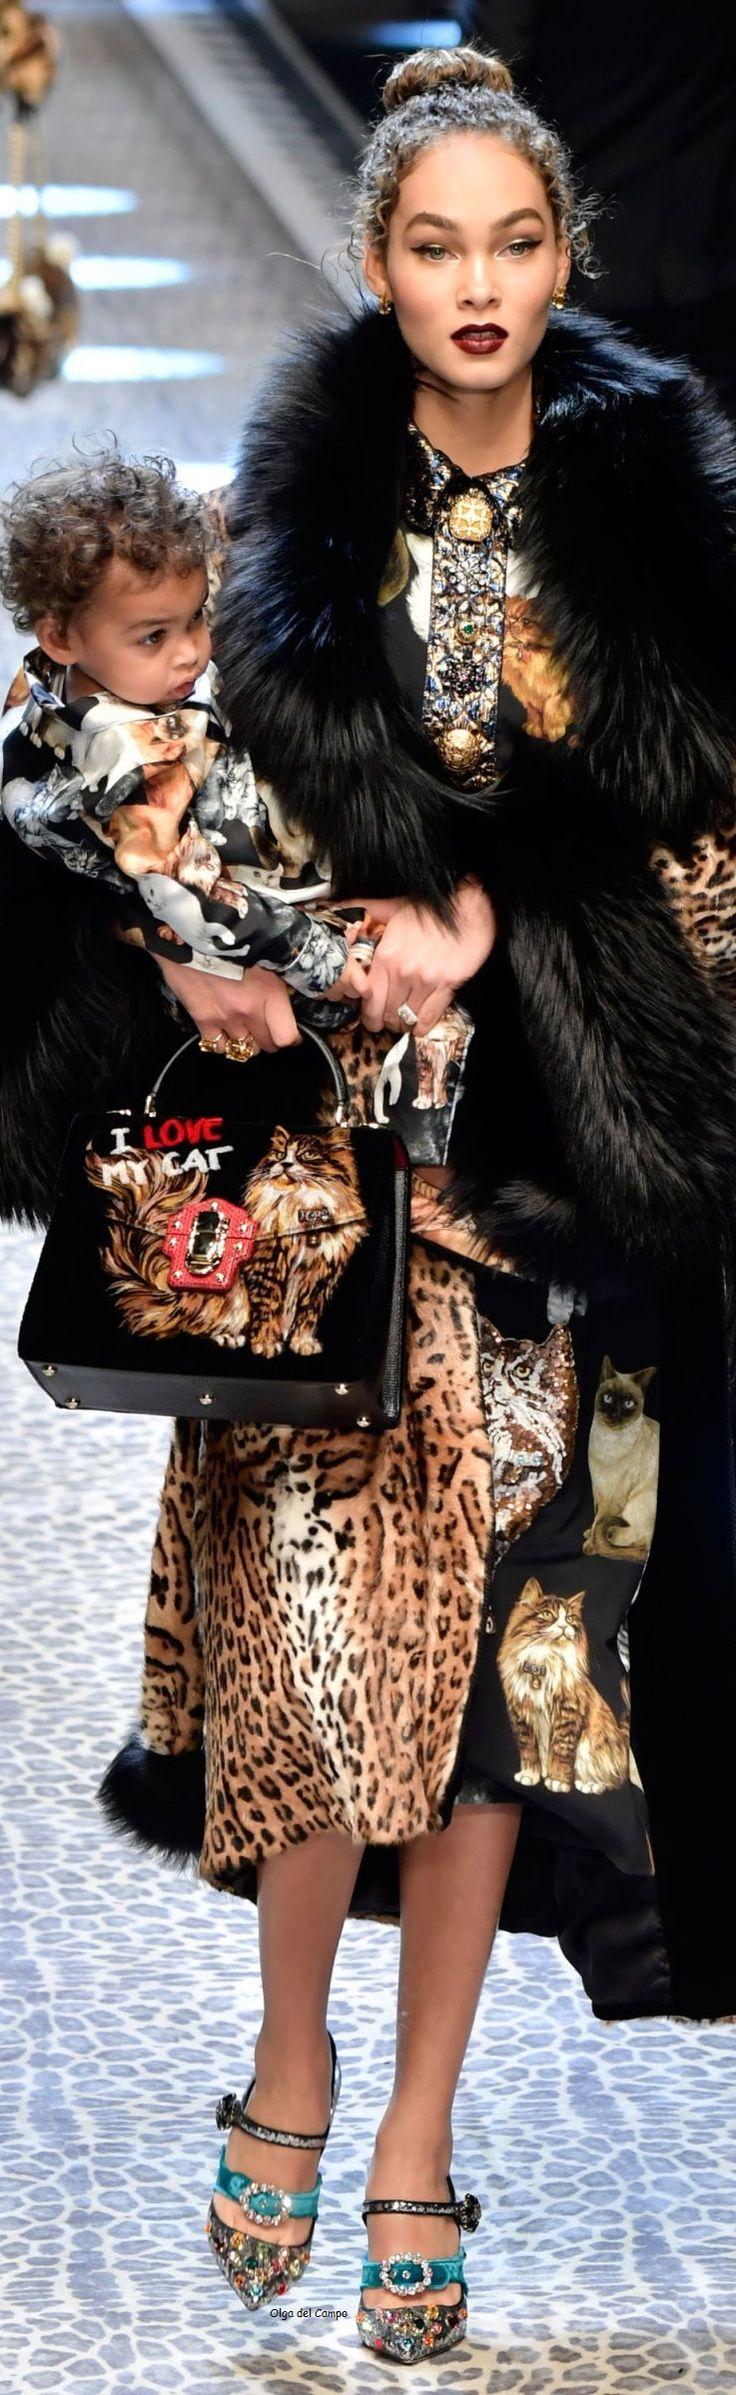 Rosamaria G Frangini   High Casual Fashion   BlackKaleidoscope   Dolce and Gabbana FW 2017